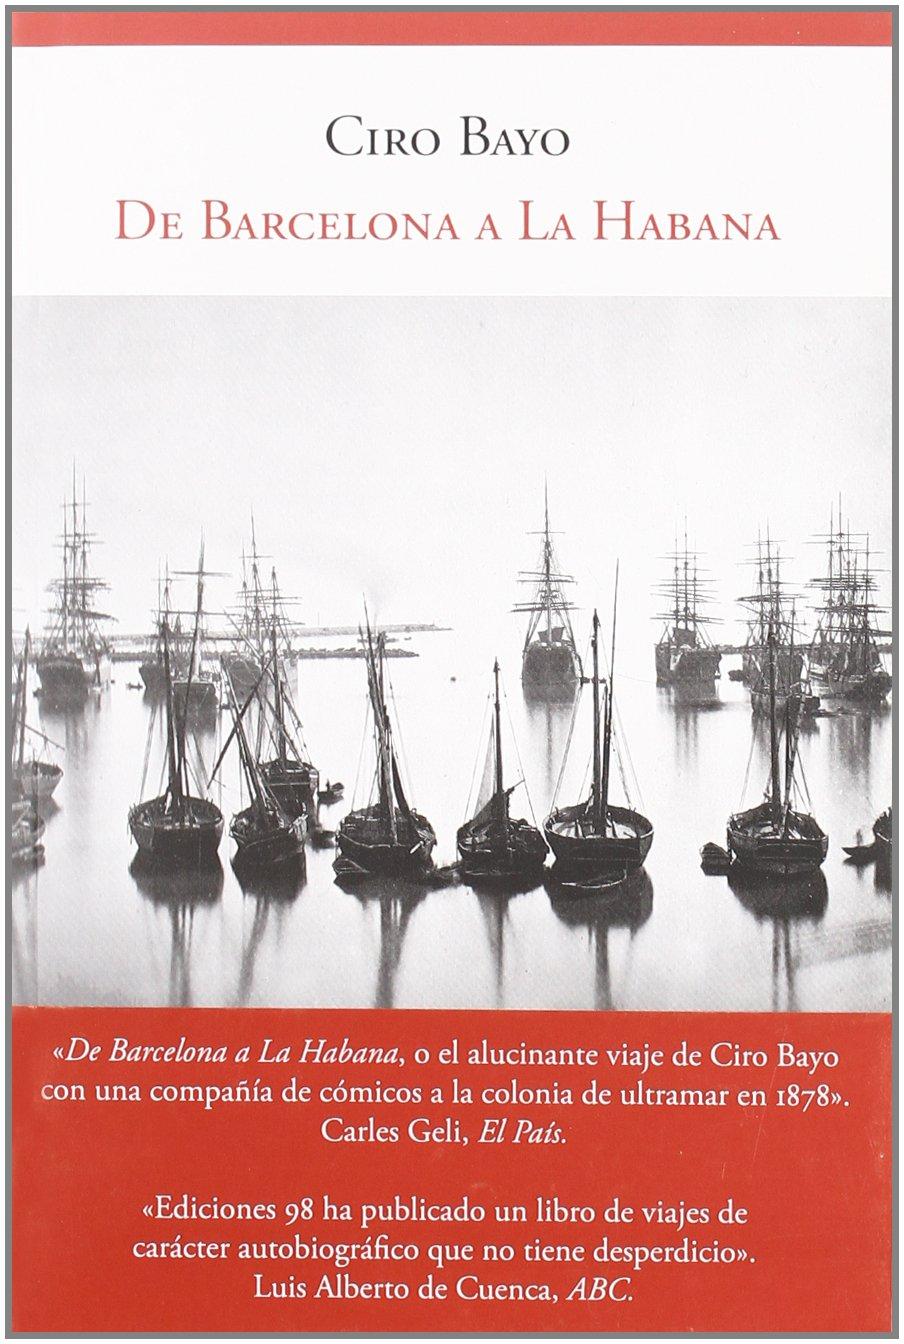 De Barcelona a La Habana: Ciro/ Blázquez González, Jesús Alfonso ed. lit. Bayo Santuola: 9788493822125: Amazon.com: Books